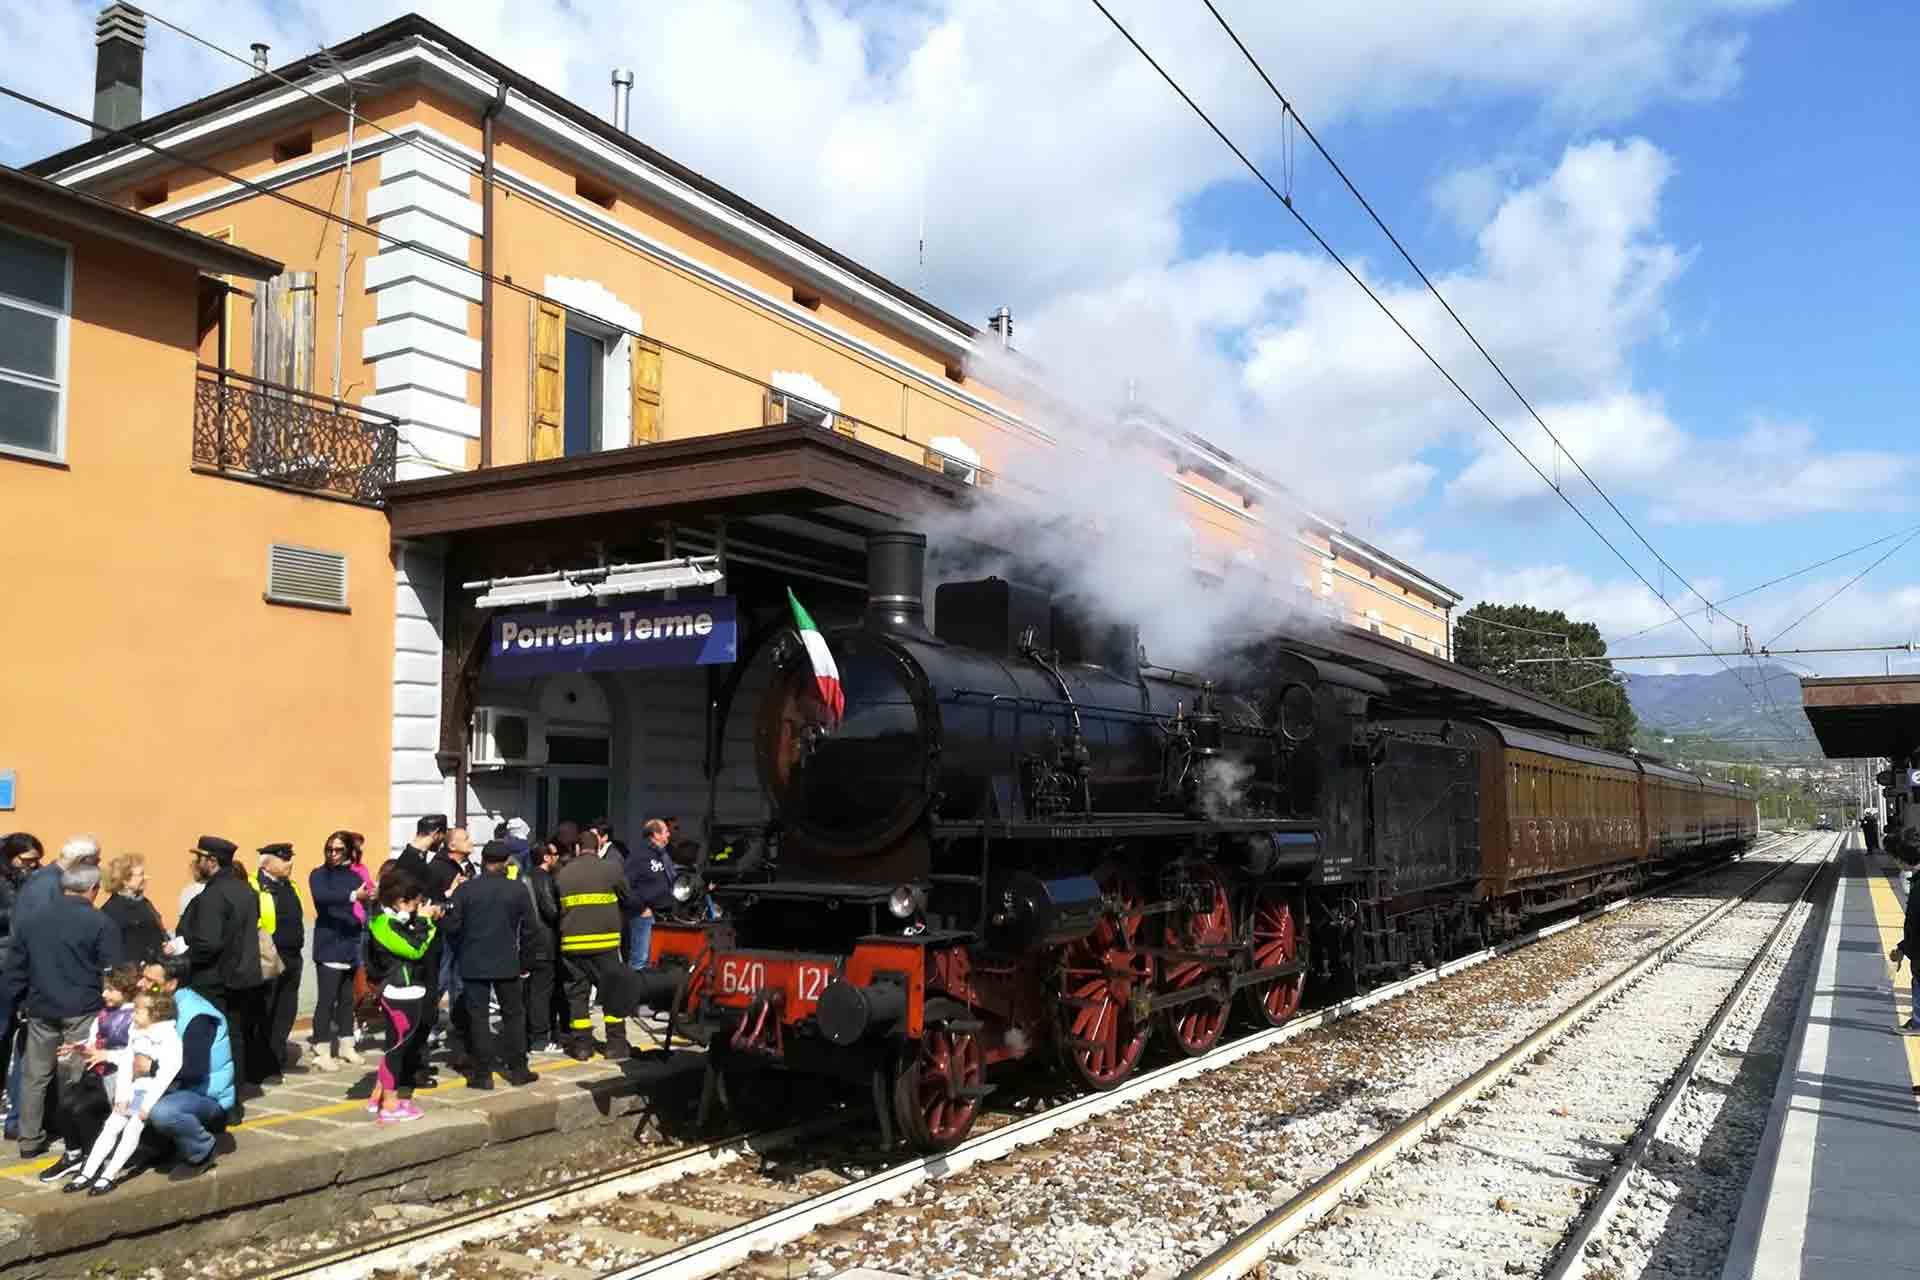 treno storico viaggio slow